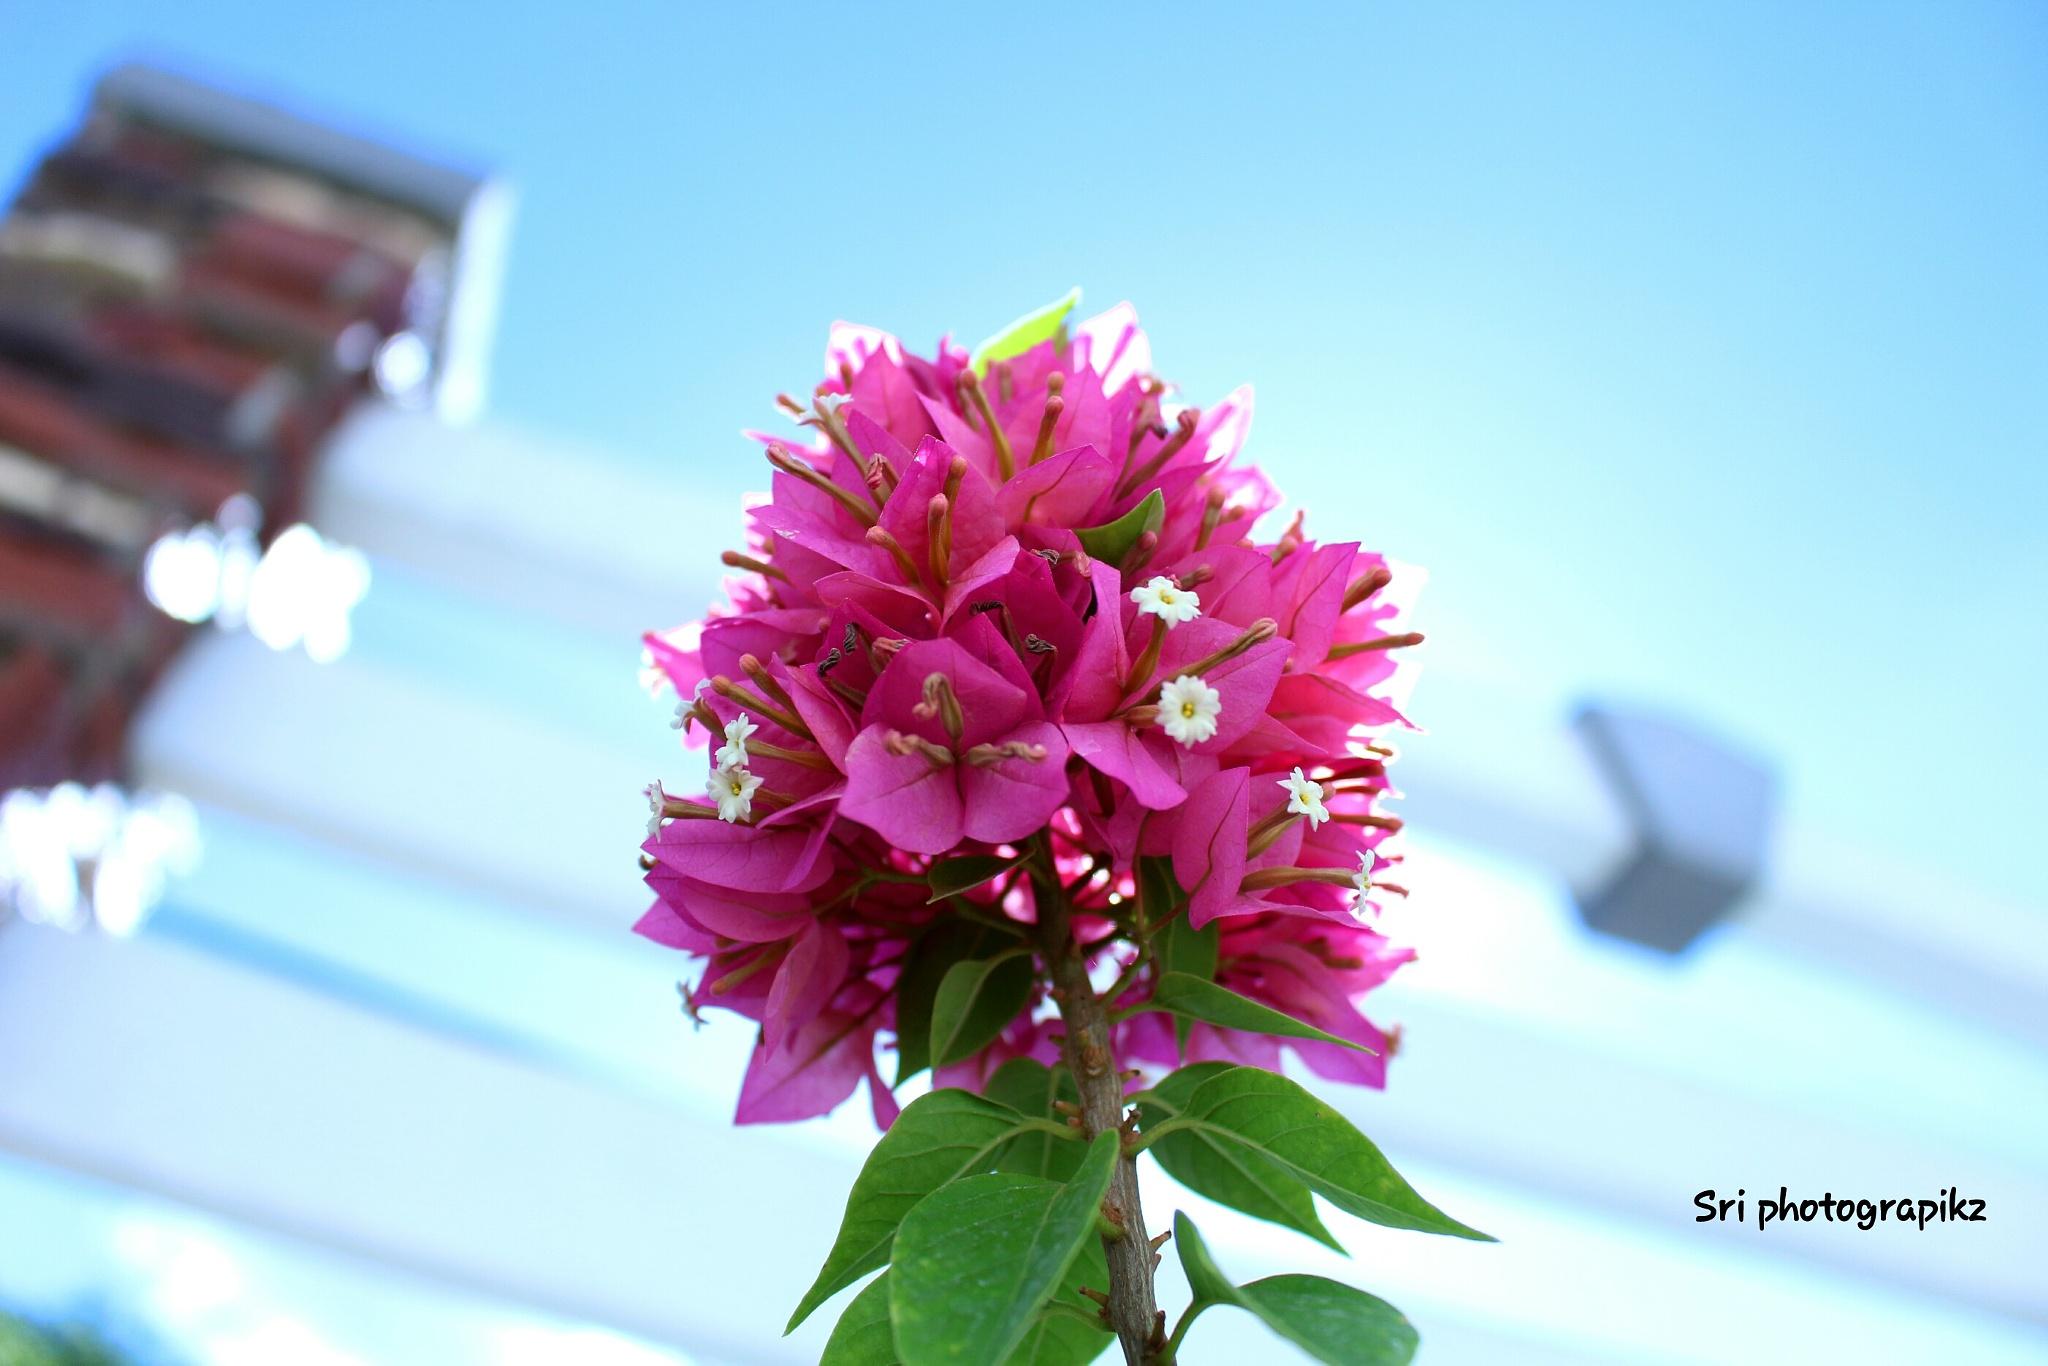 Bougainvillea flowers  by Jawahar srinath